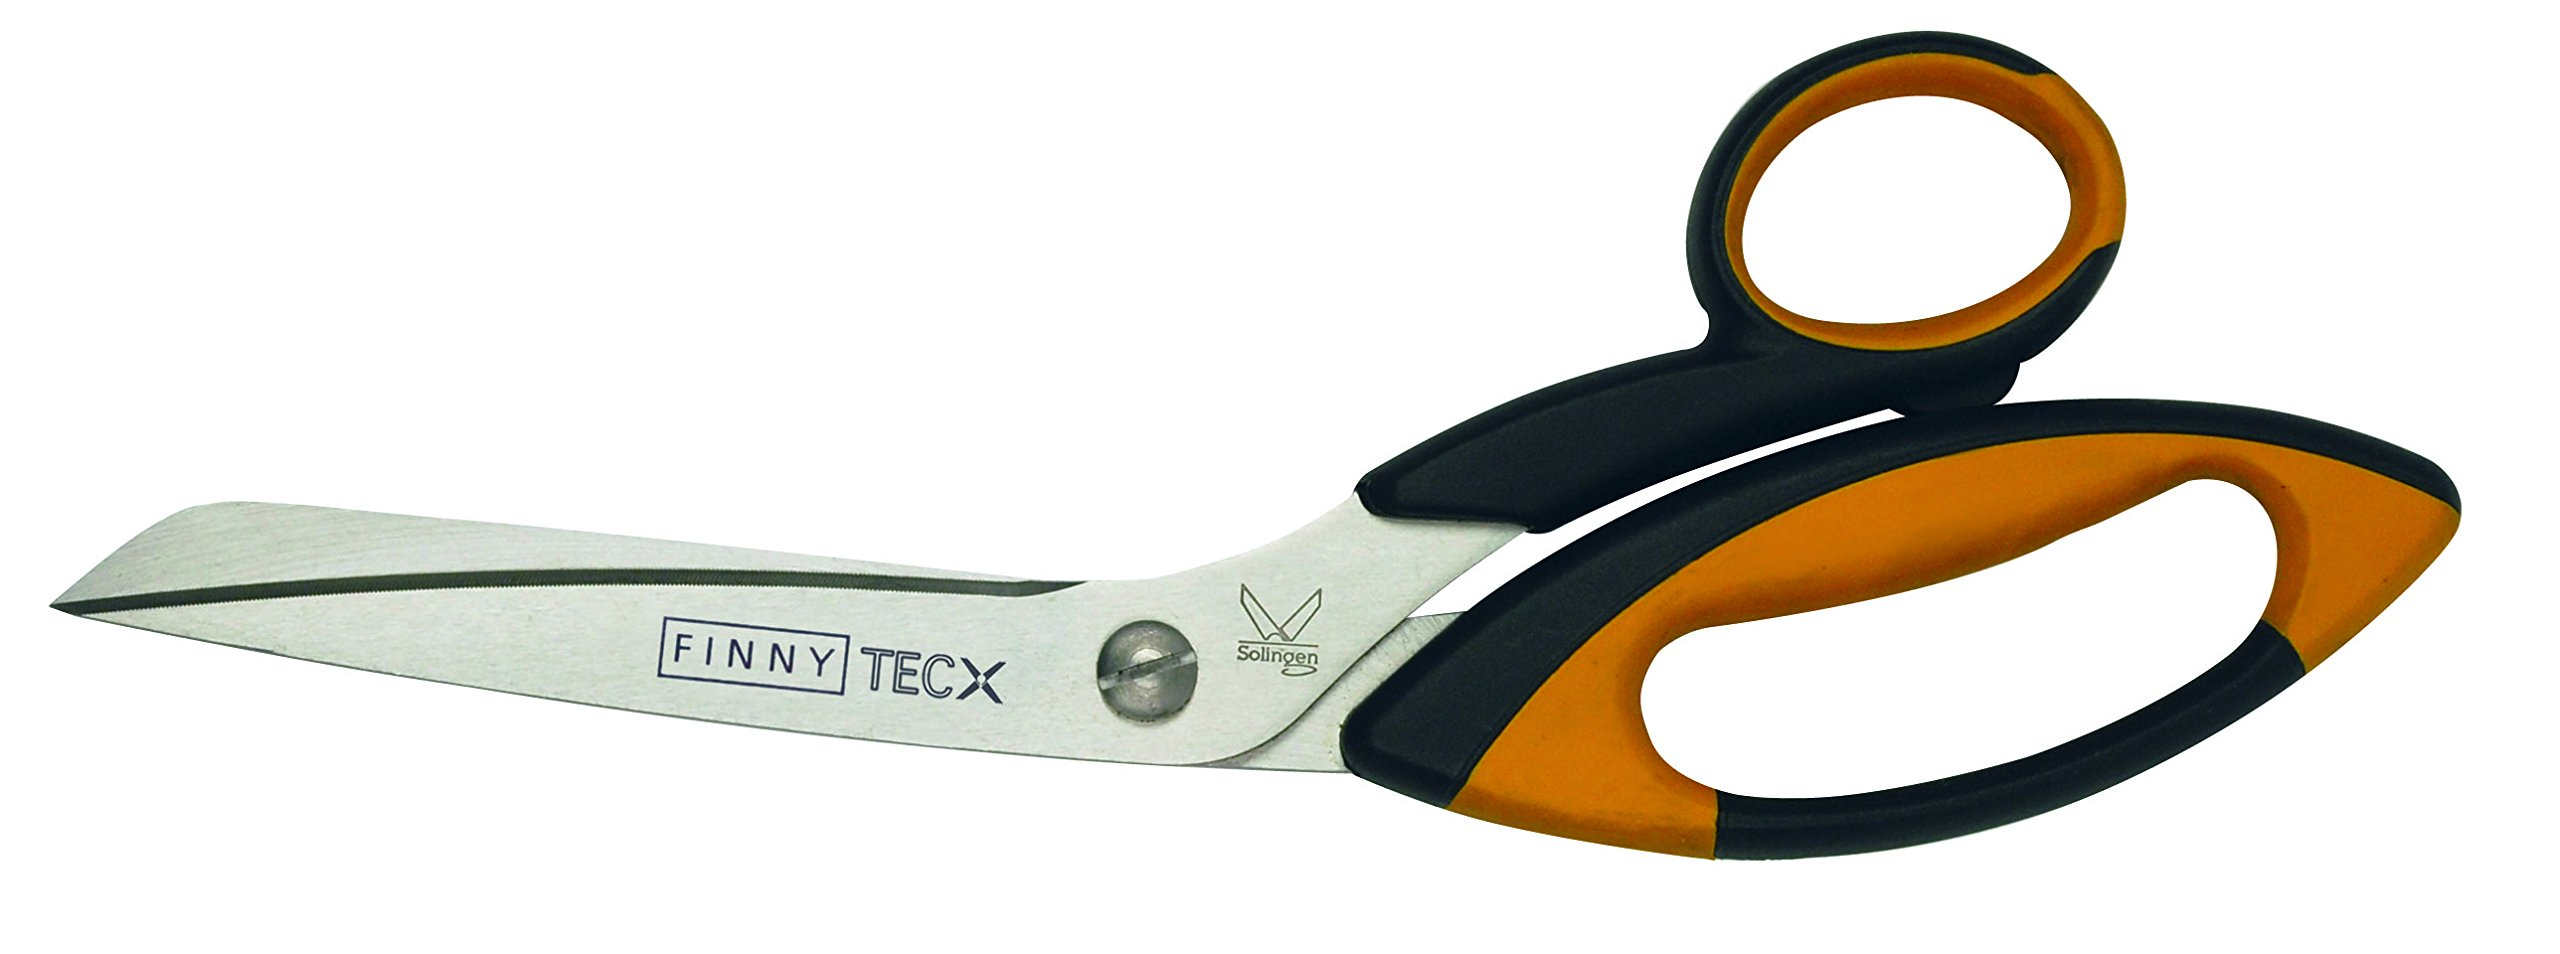 Kretzer TecX1 733225 (73725) 10.0''/ 25cm - Heavy Duty, Fiberglass / Light Aramid Shears by Kretzer